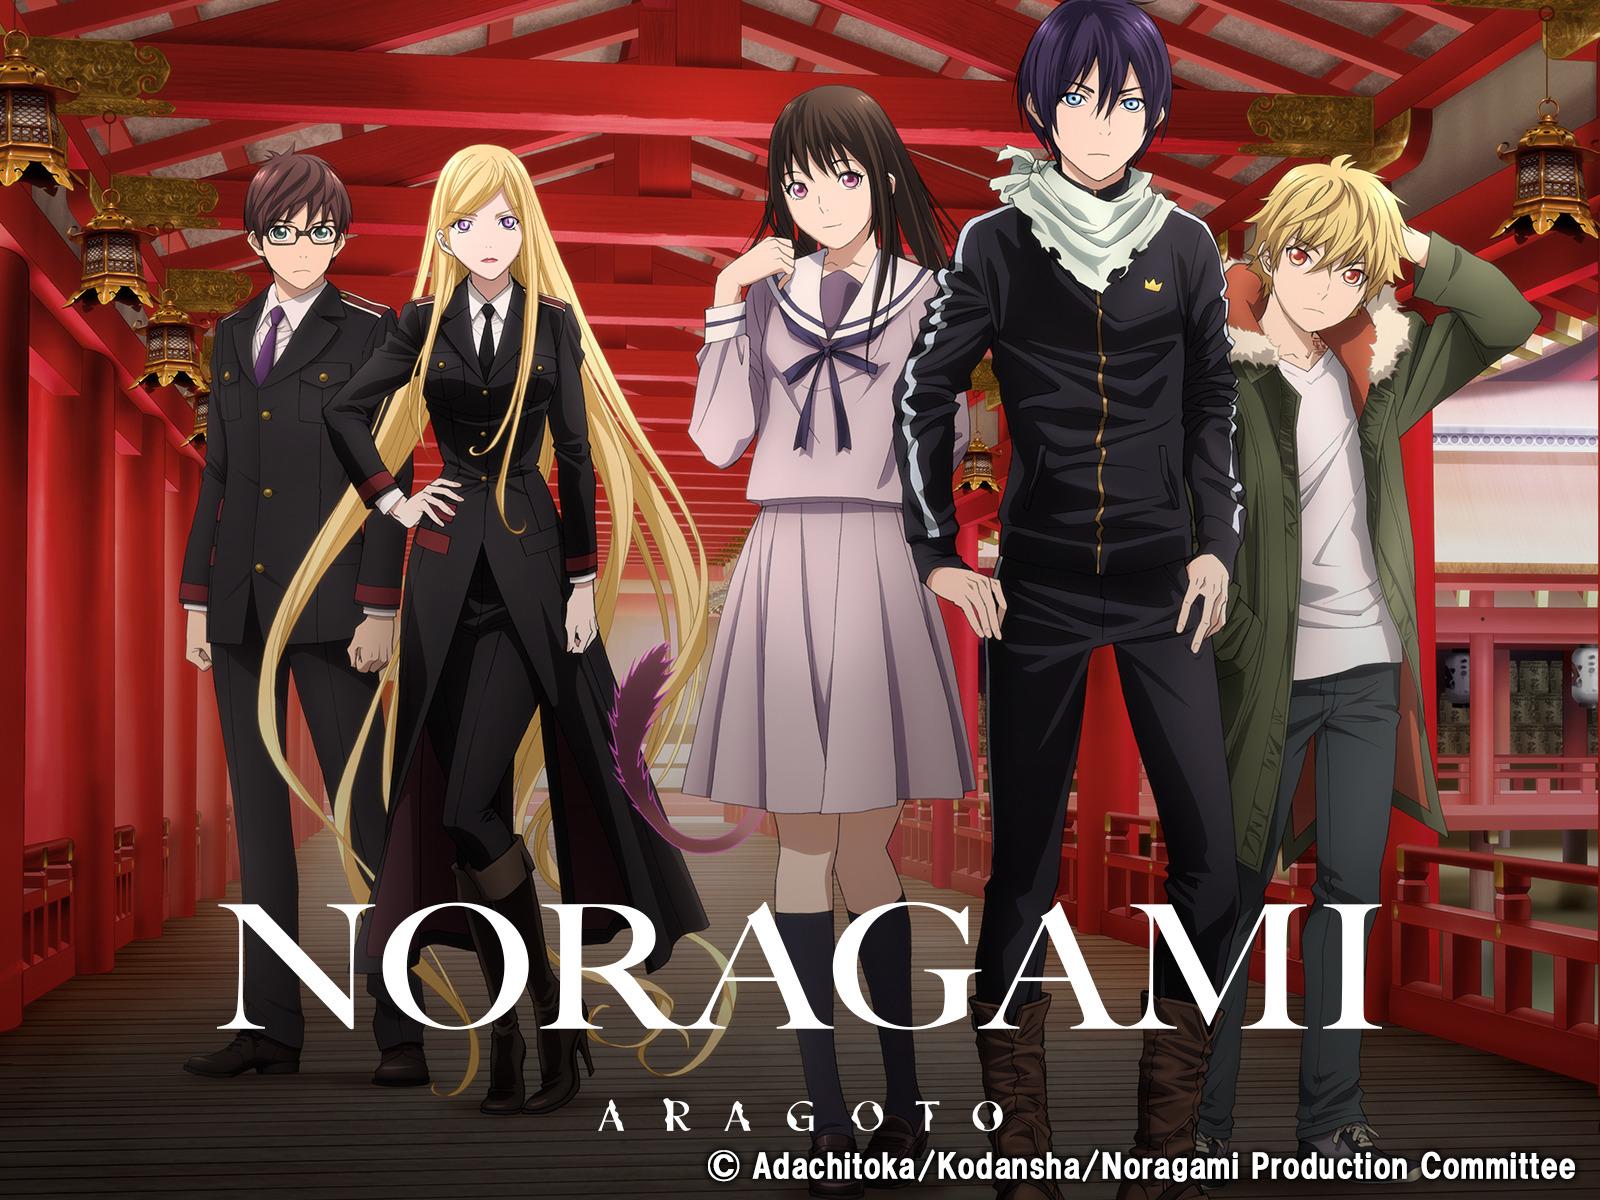 Prime Video: Noragami Aragoto